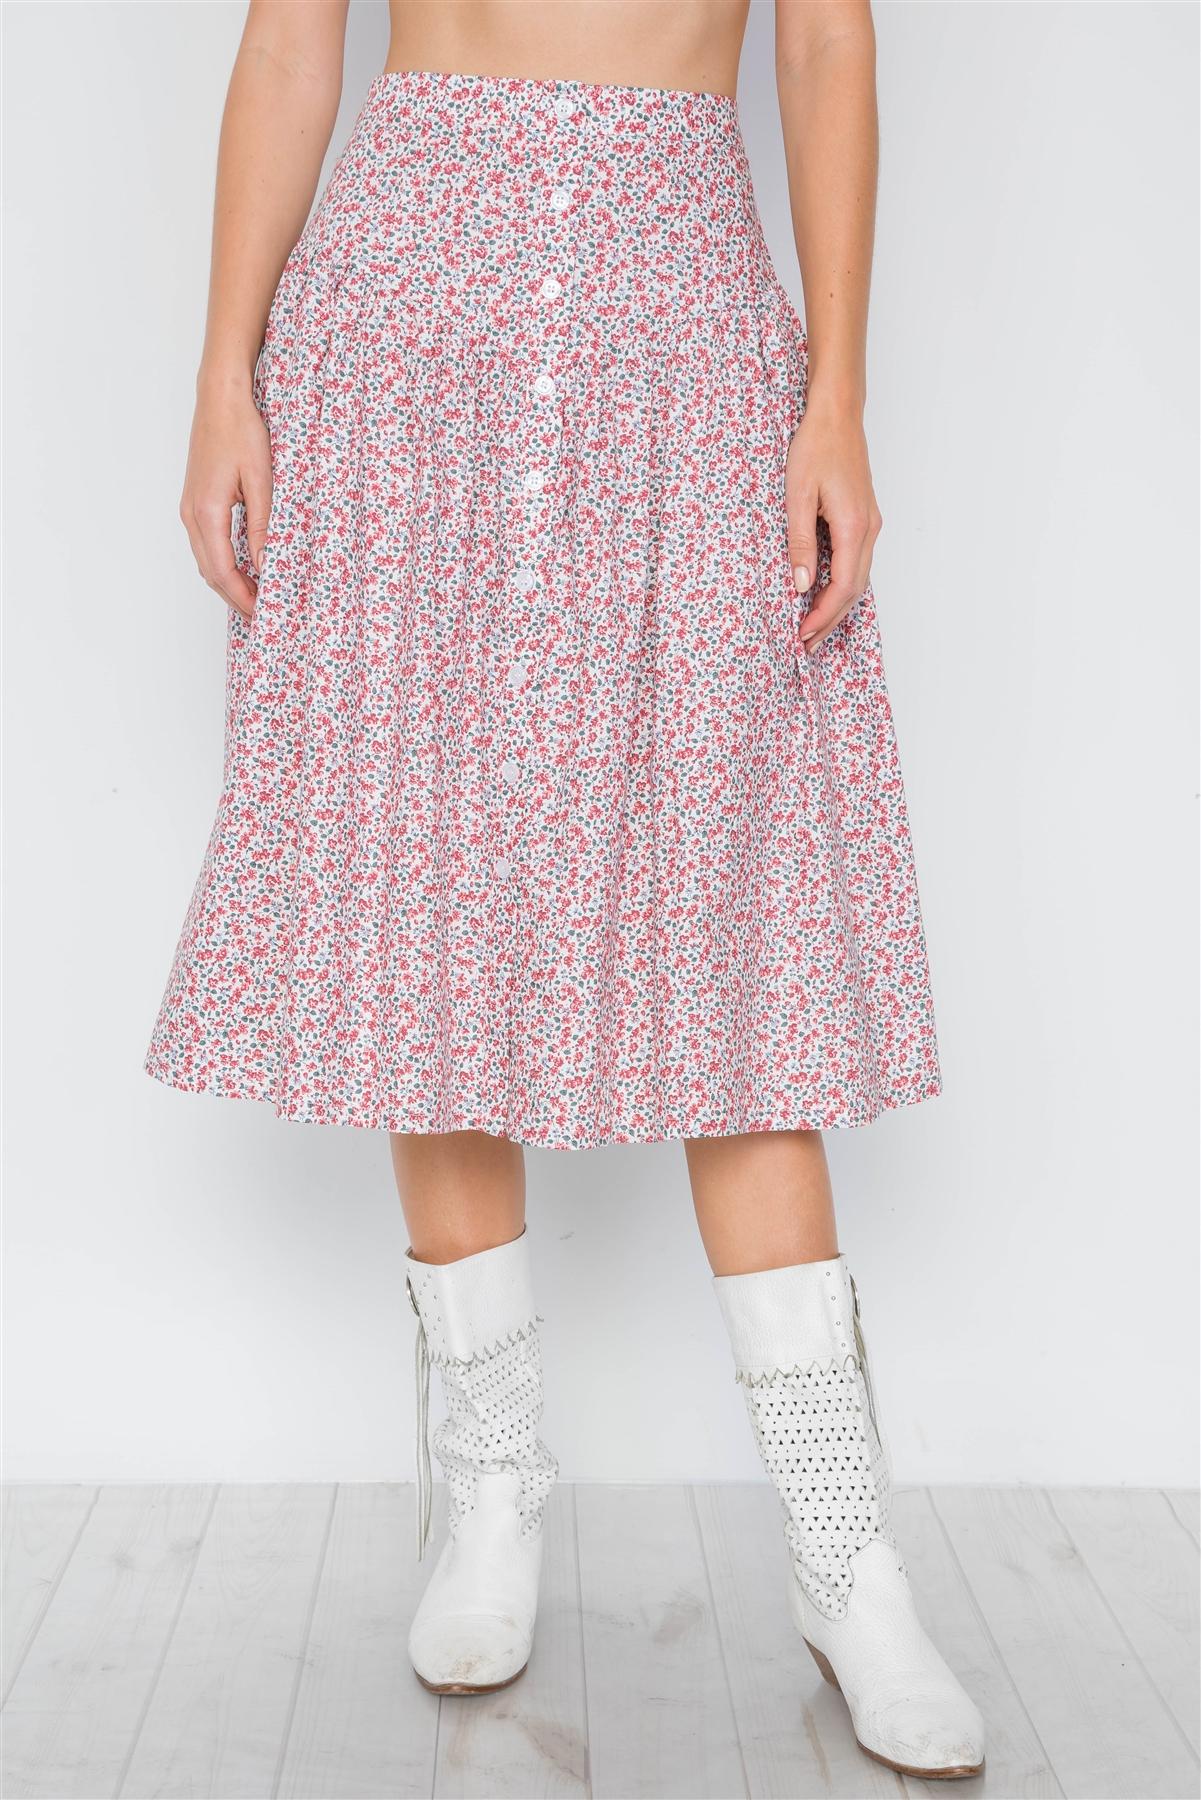 4e49eac16b76 Printed High Waisted Skirt - ShopStyle